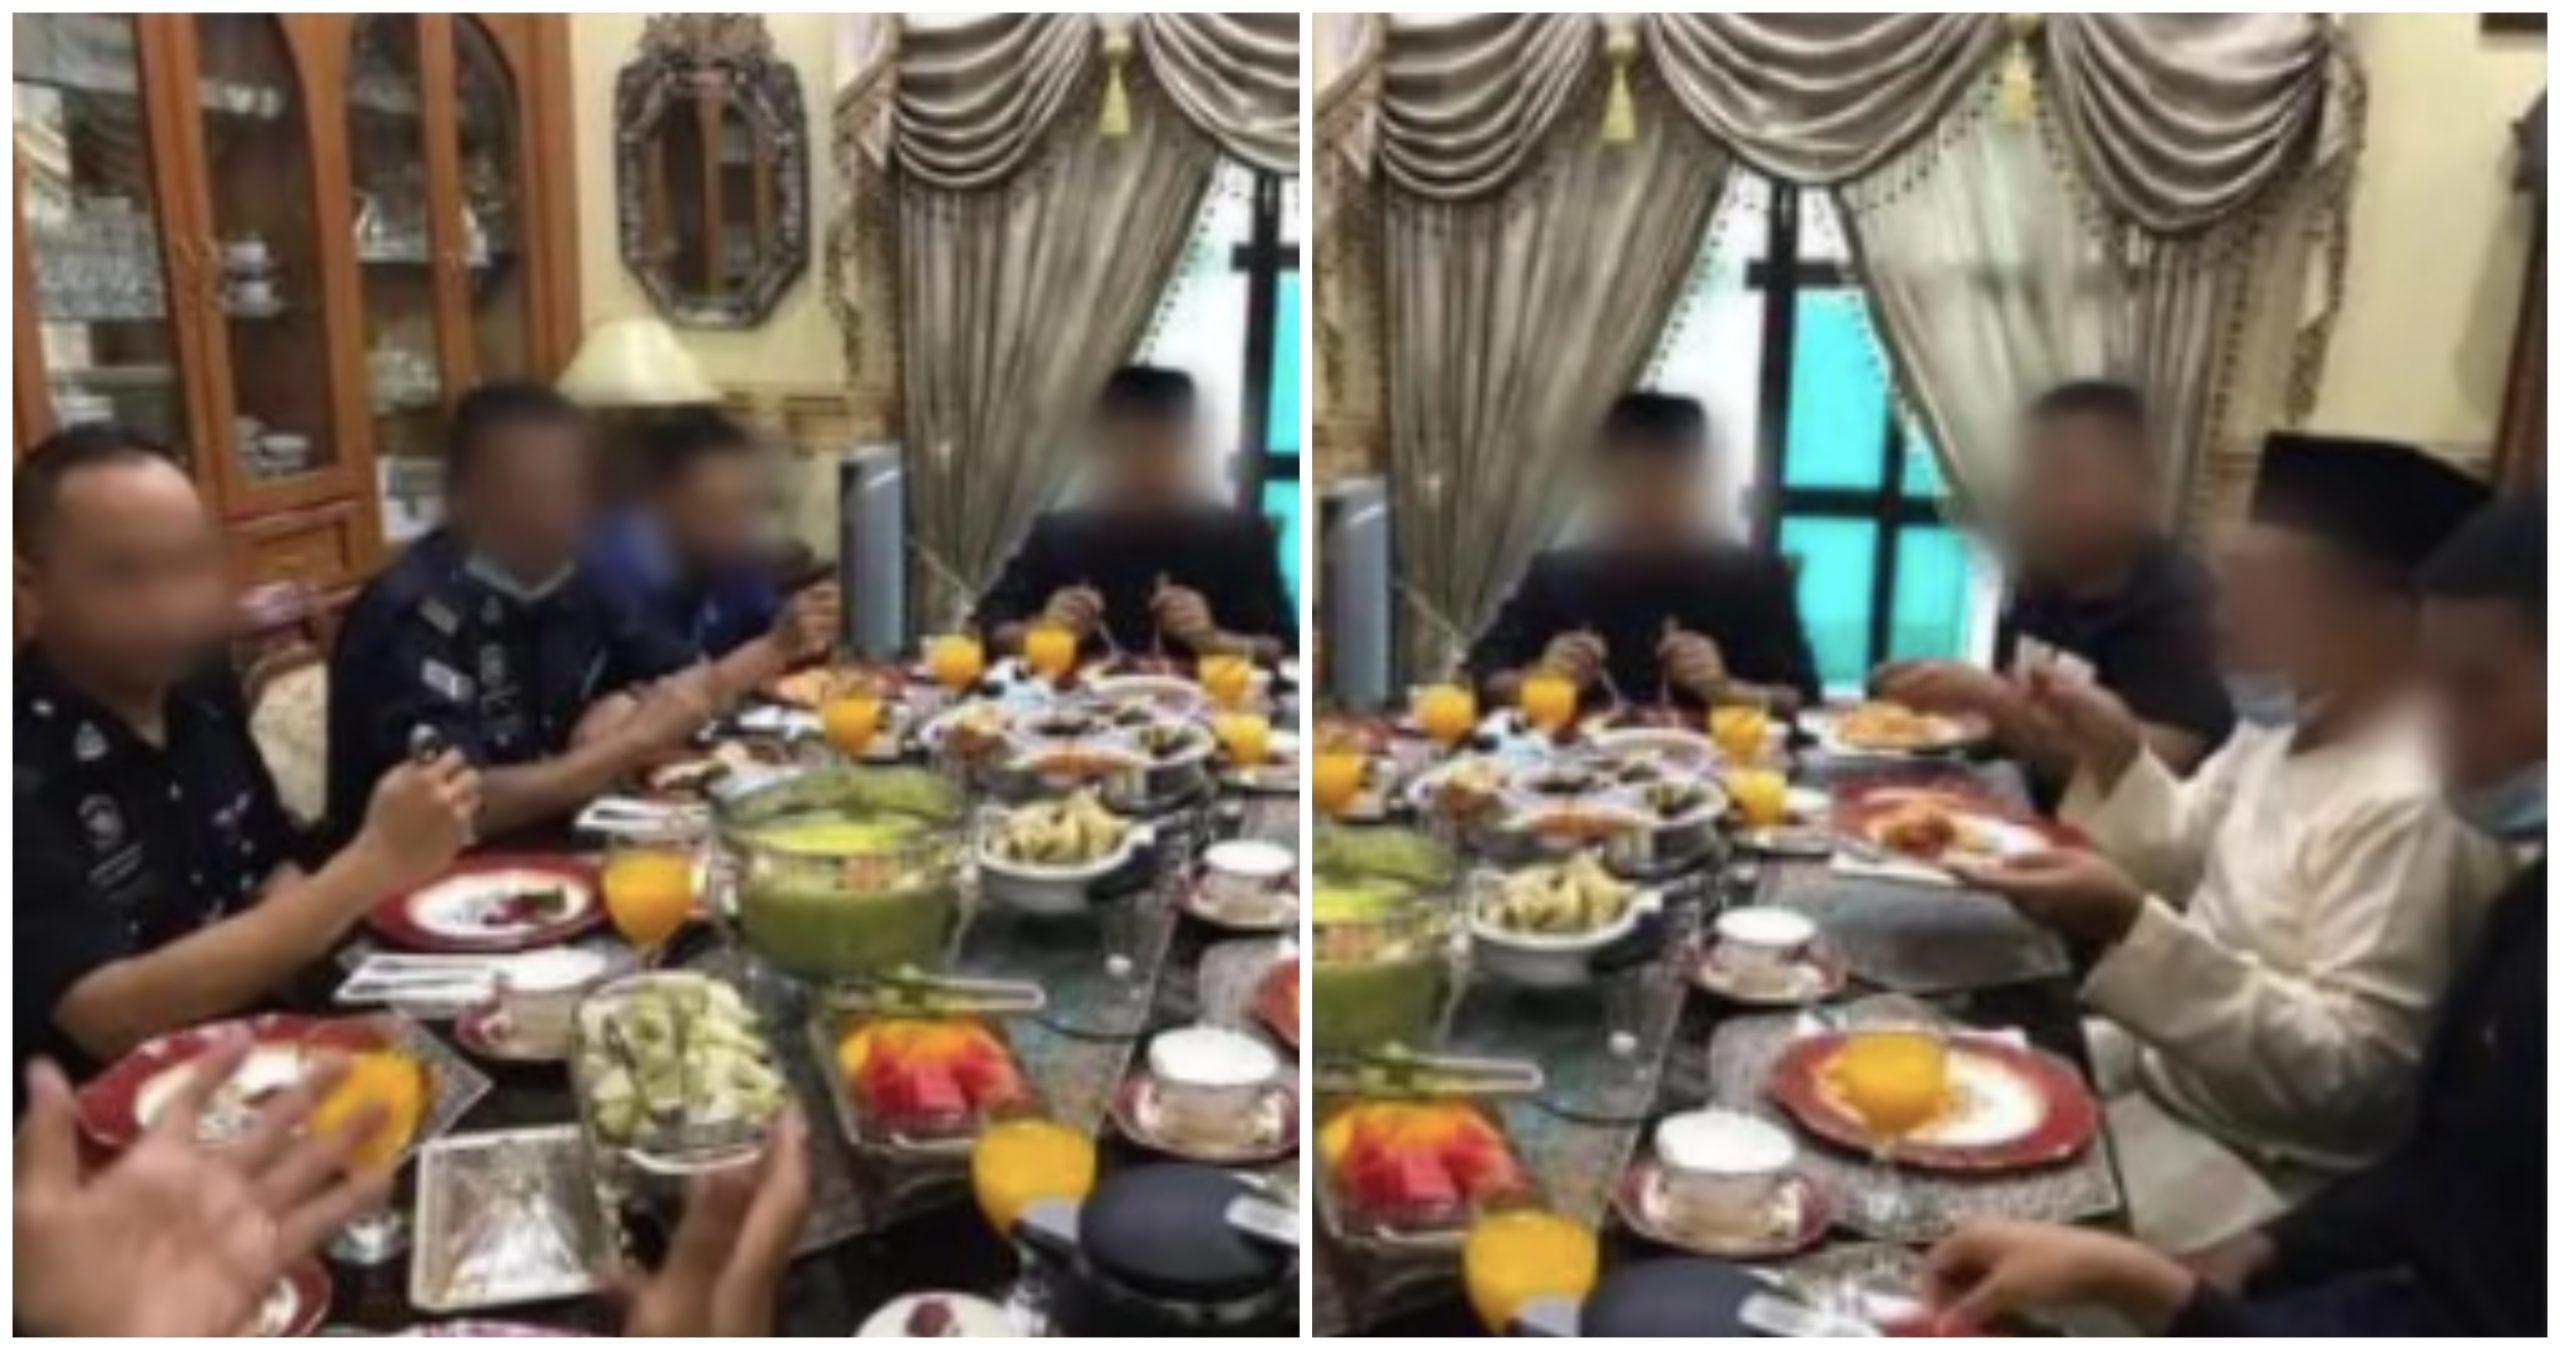 Jemput Anggota Masuk Makan Juadah Raya, Bekas Pegawai Polis Disiasat 2